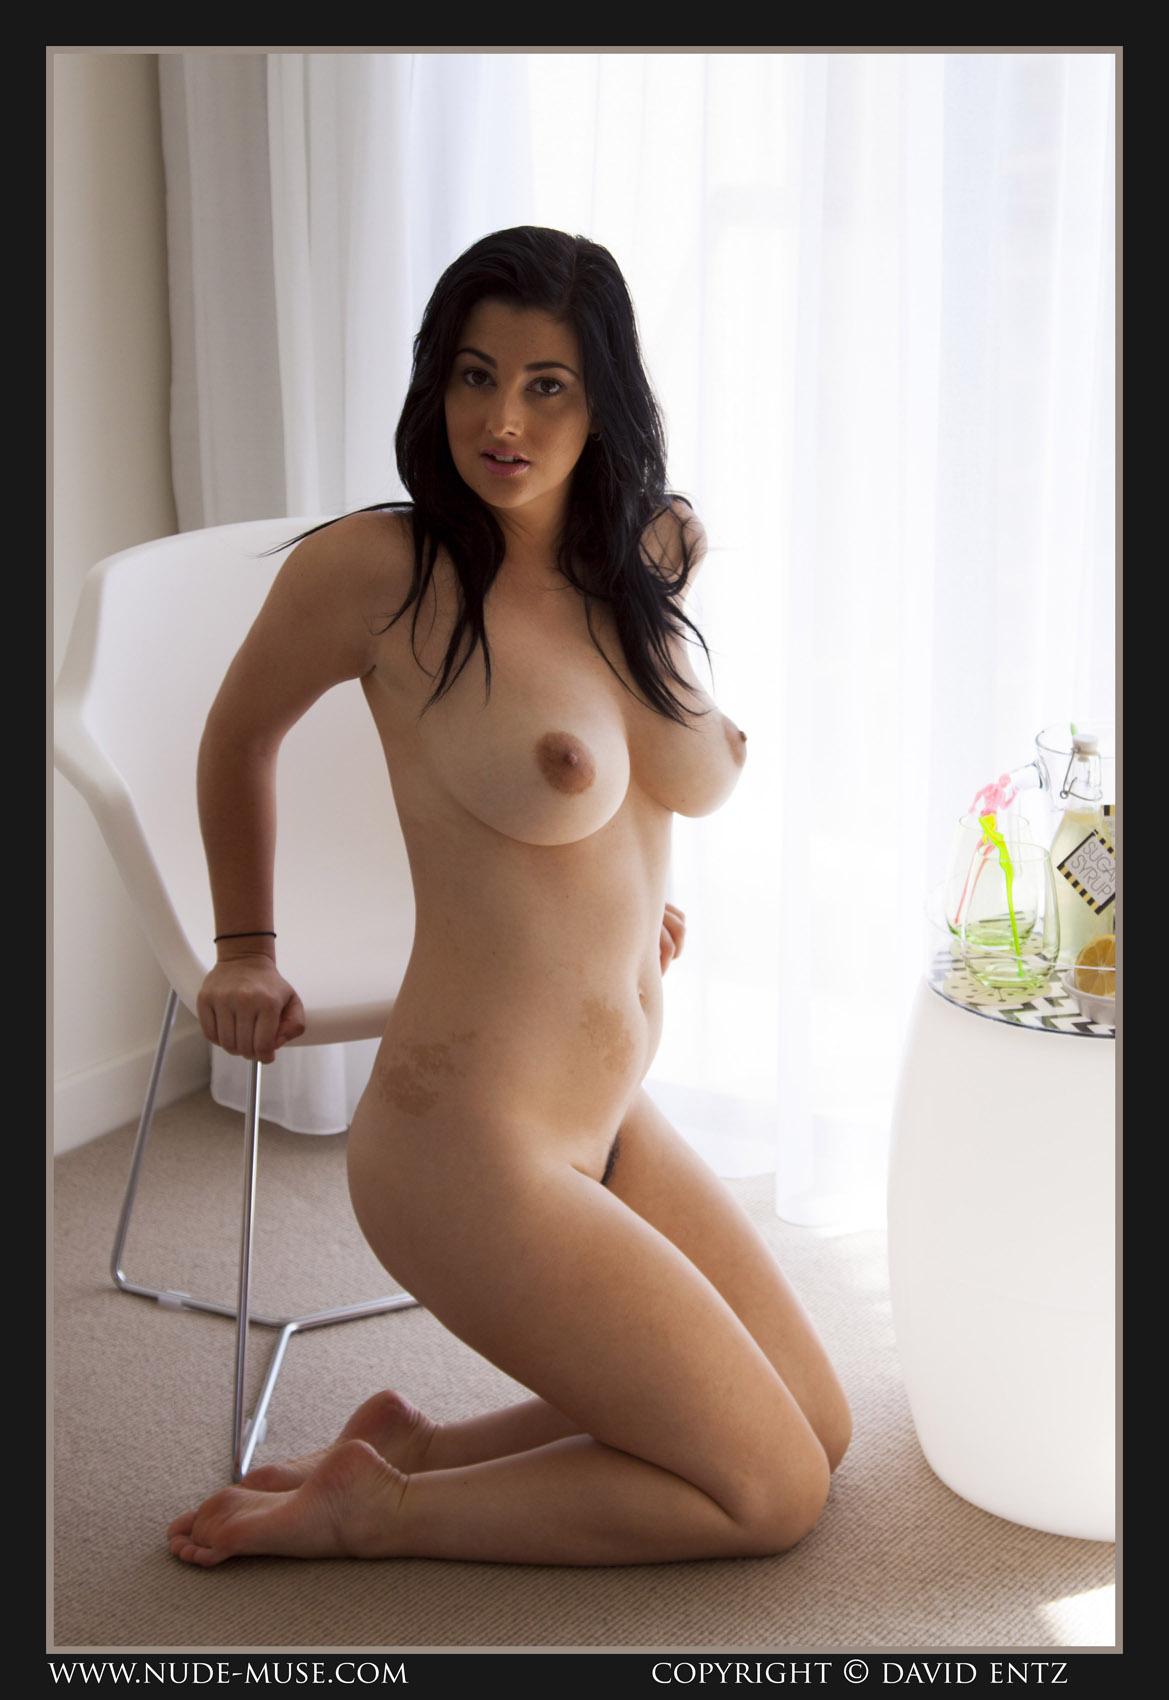 Scarlett Morgan Making Lemonade Nude Muse - Curvy Erotic